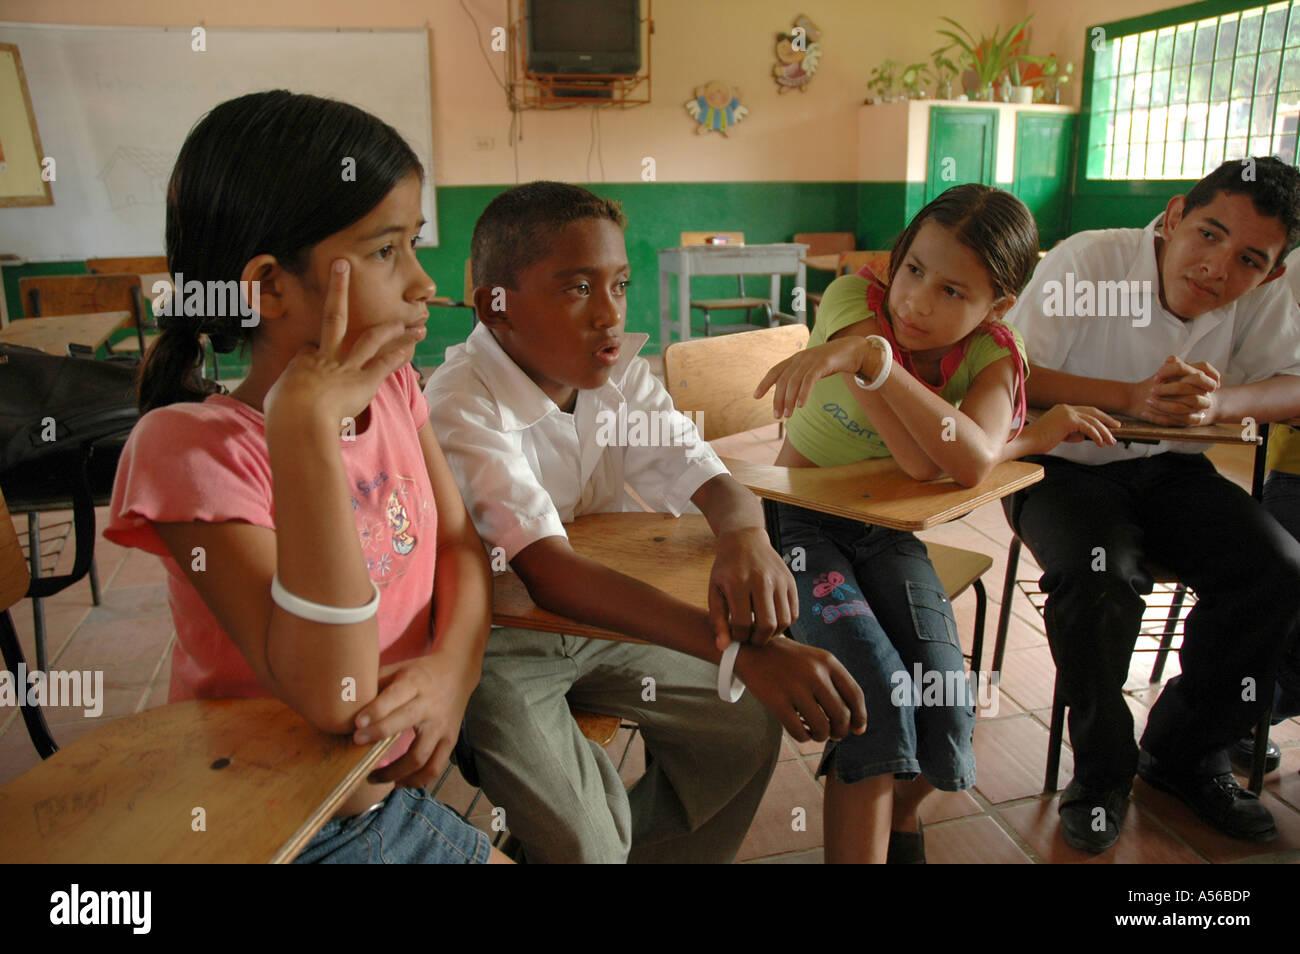 Painet iy8254 students teacher colombia extracurricular seminar middle school paz barrancabermeja children kids - Stock Image